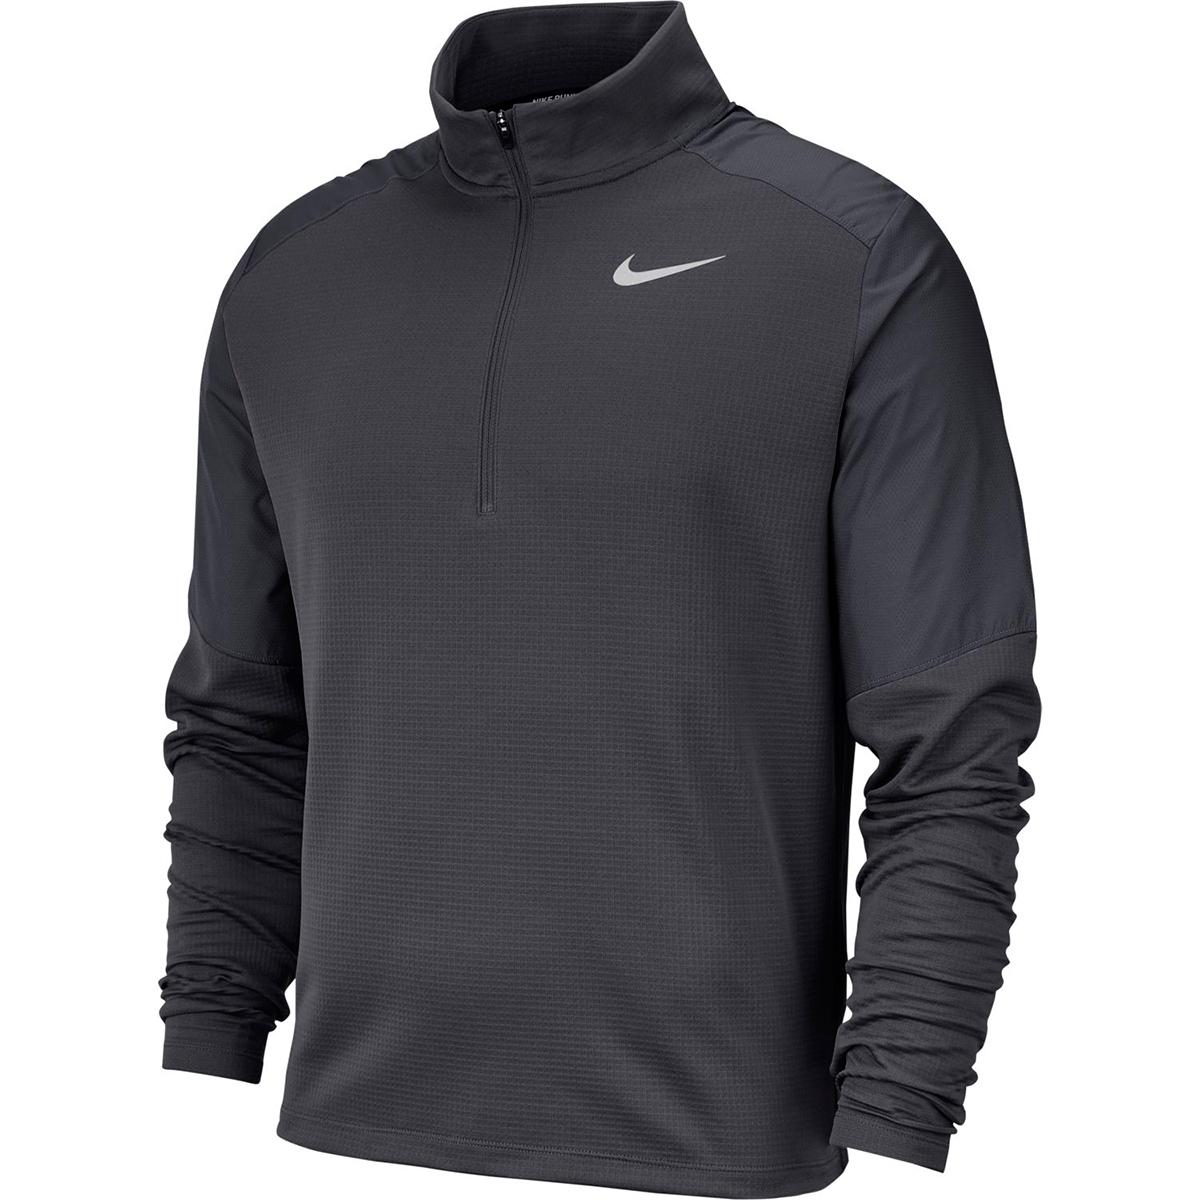 Nike Men's Long-Sleeve Quarter Zip Pacer Top - Black, XL